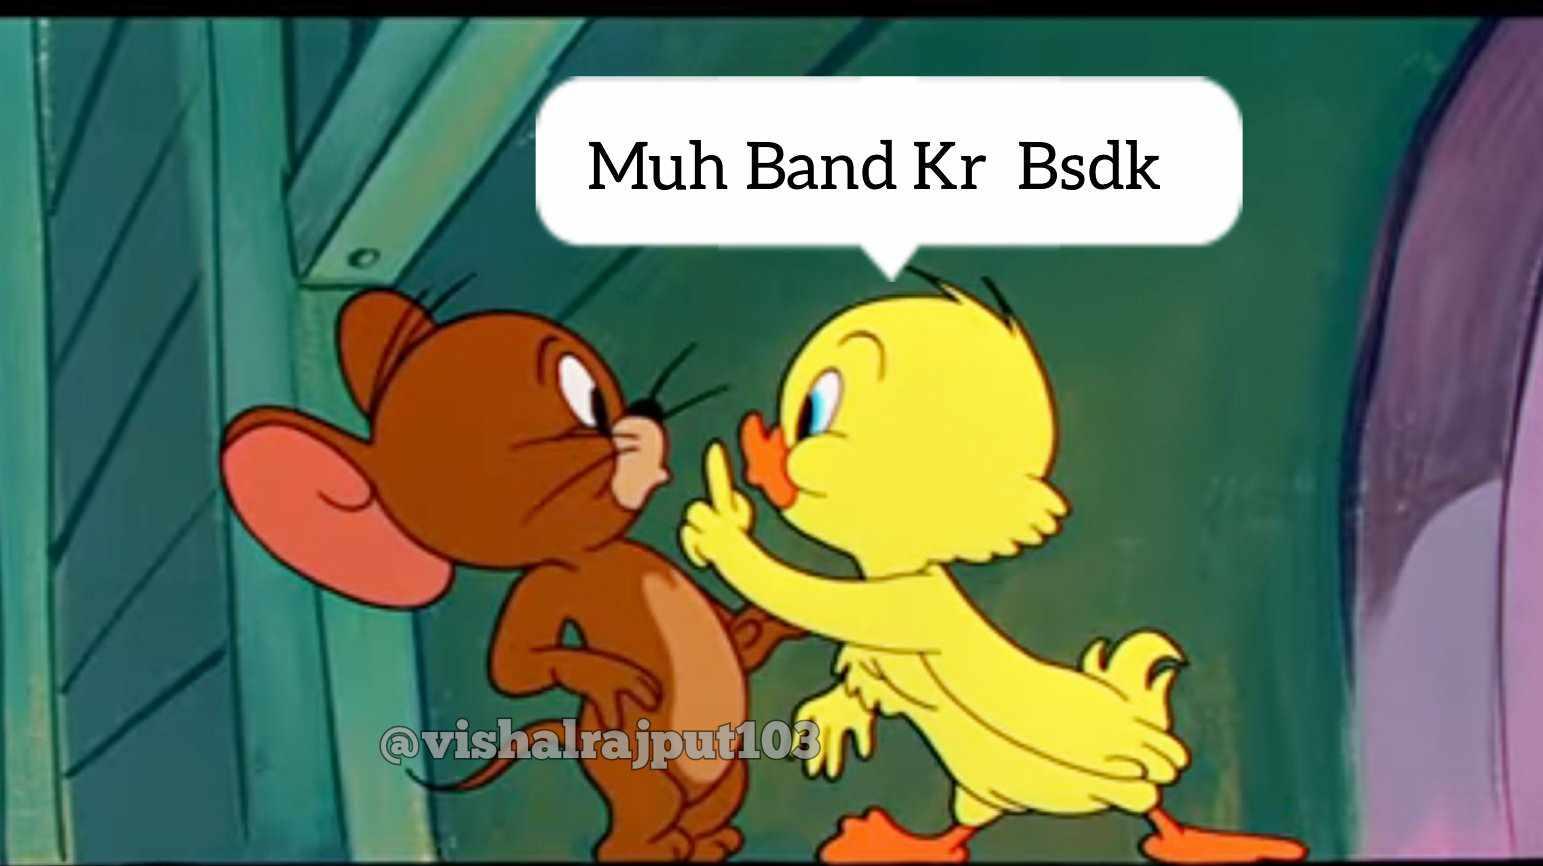 jerry and duck muh band kar meme template